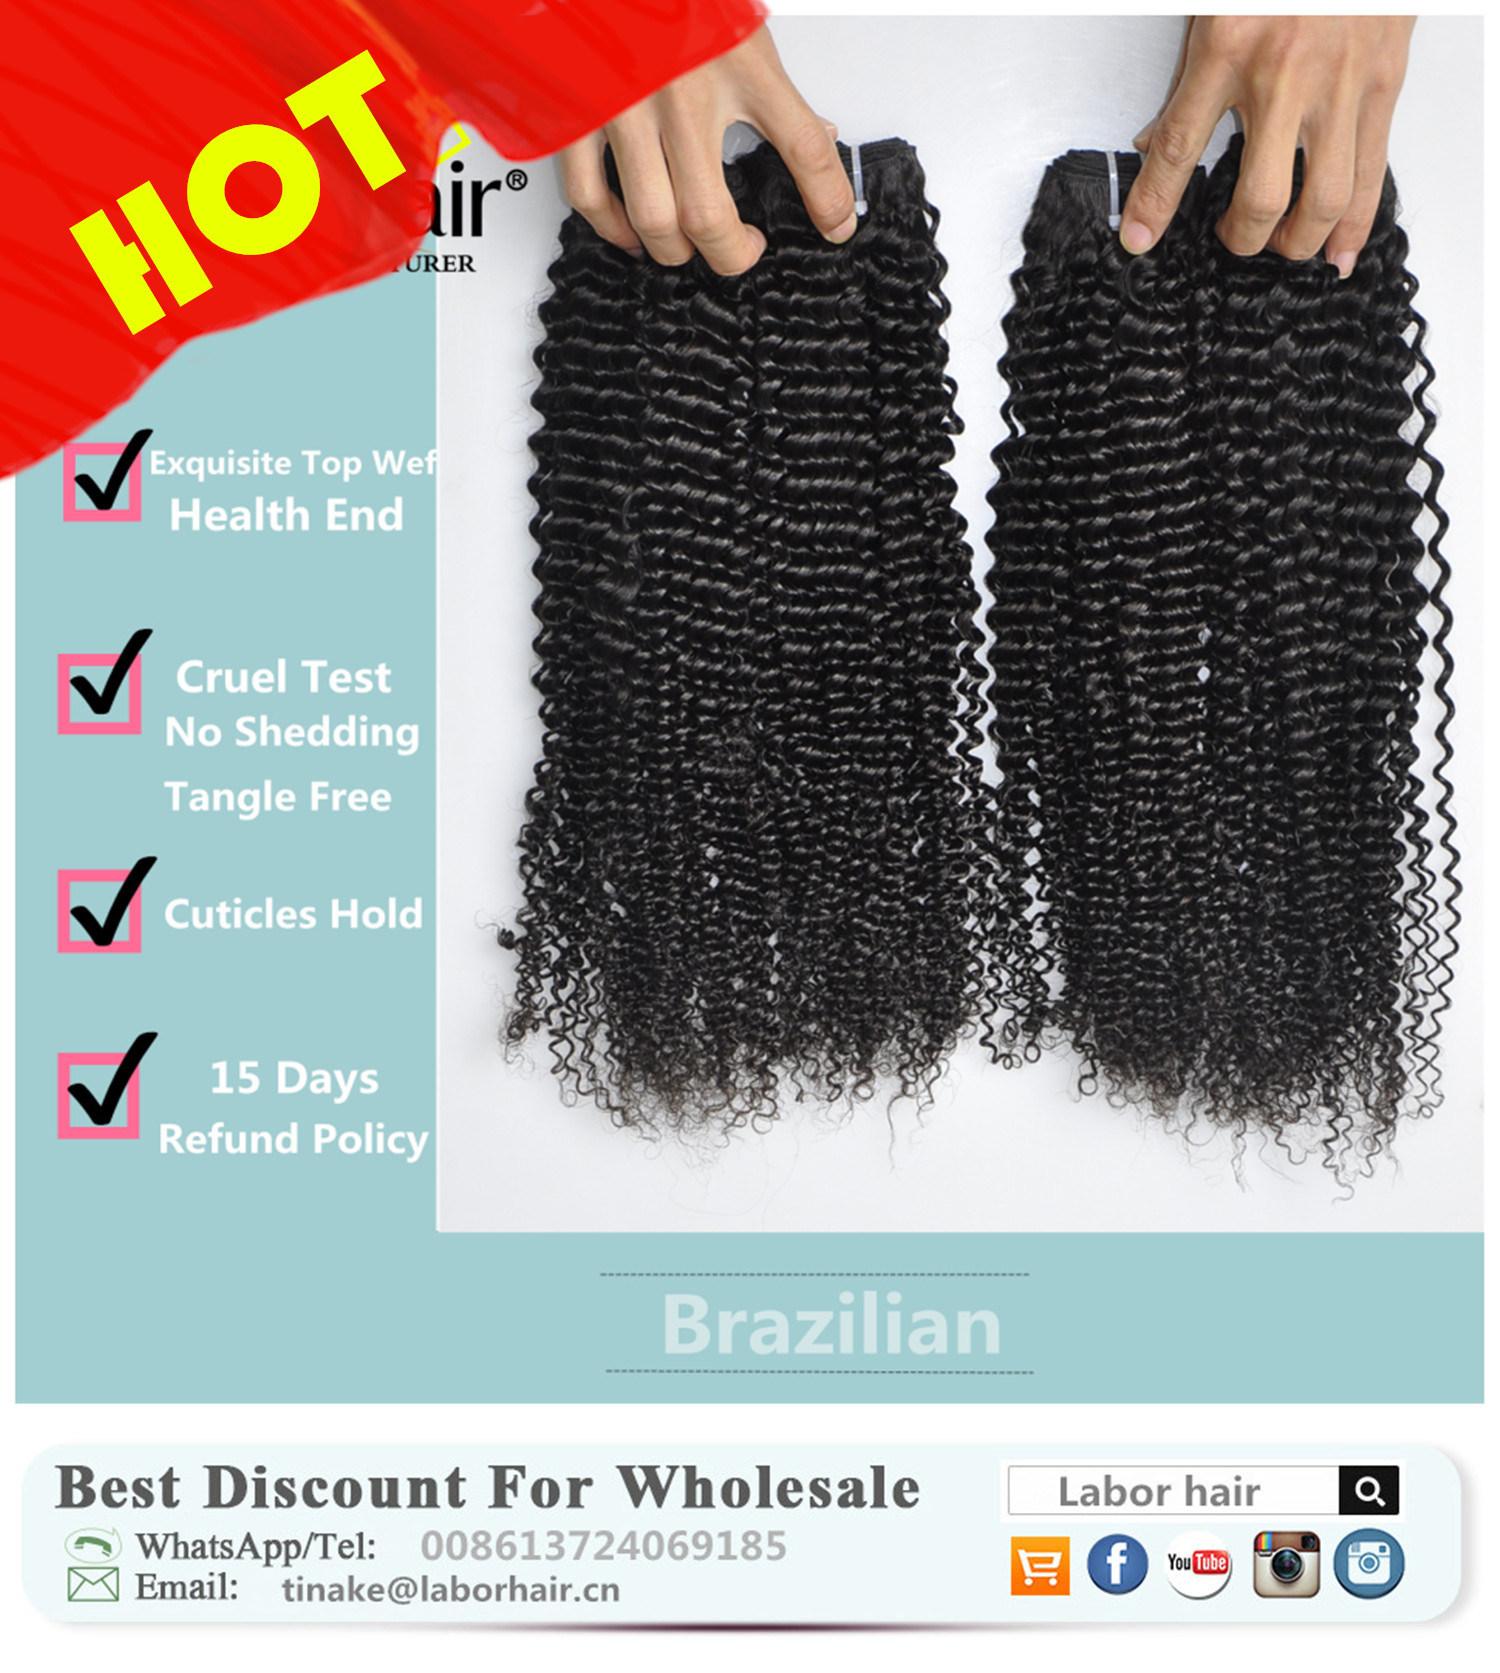 Unprocessed Labor Hair Extension 105g (+/-2g) /Bundle Natural Brazilian Virgin Hair Kinky Curly 100% Human Hair Weaves Grade 9A